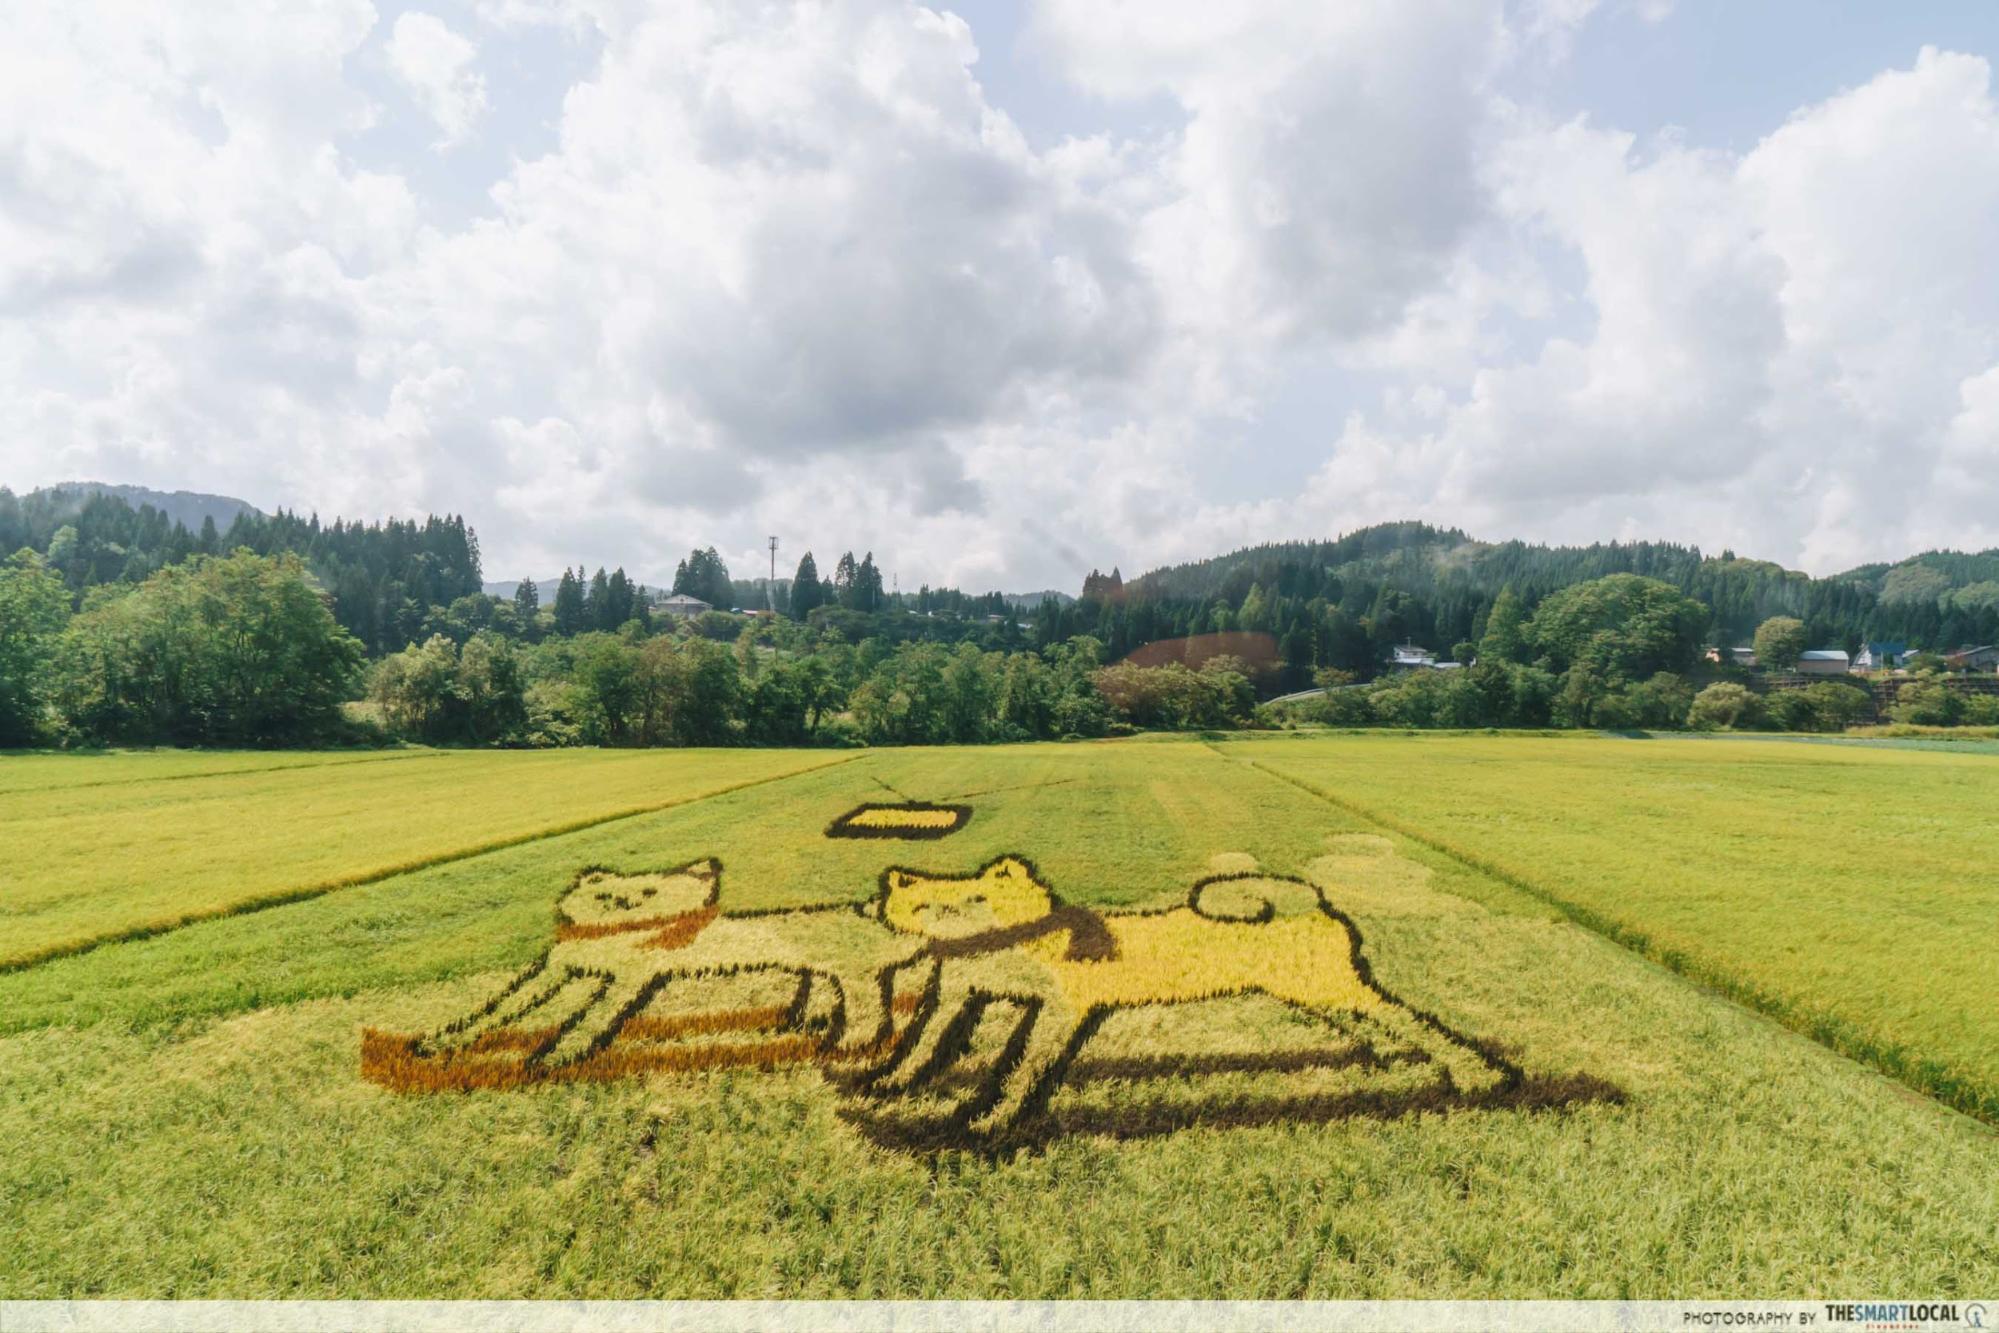 Tohoku Japan - tanbo art inakadate akita nairiku jukan tetsudo rail